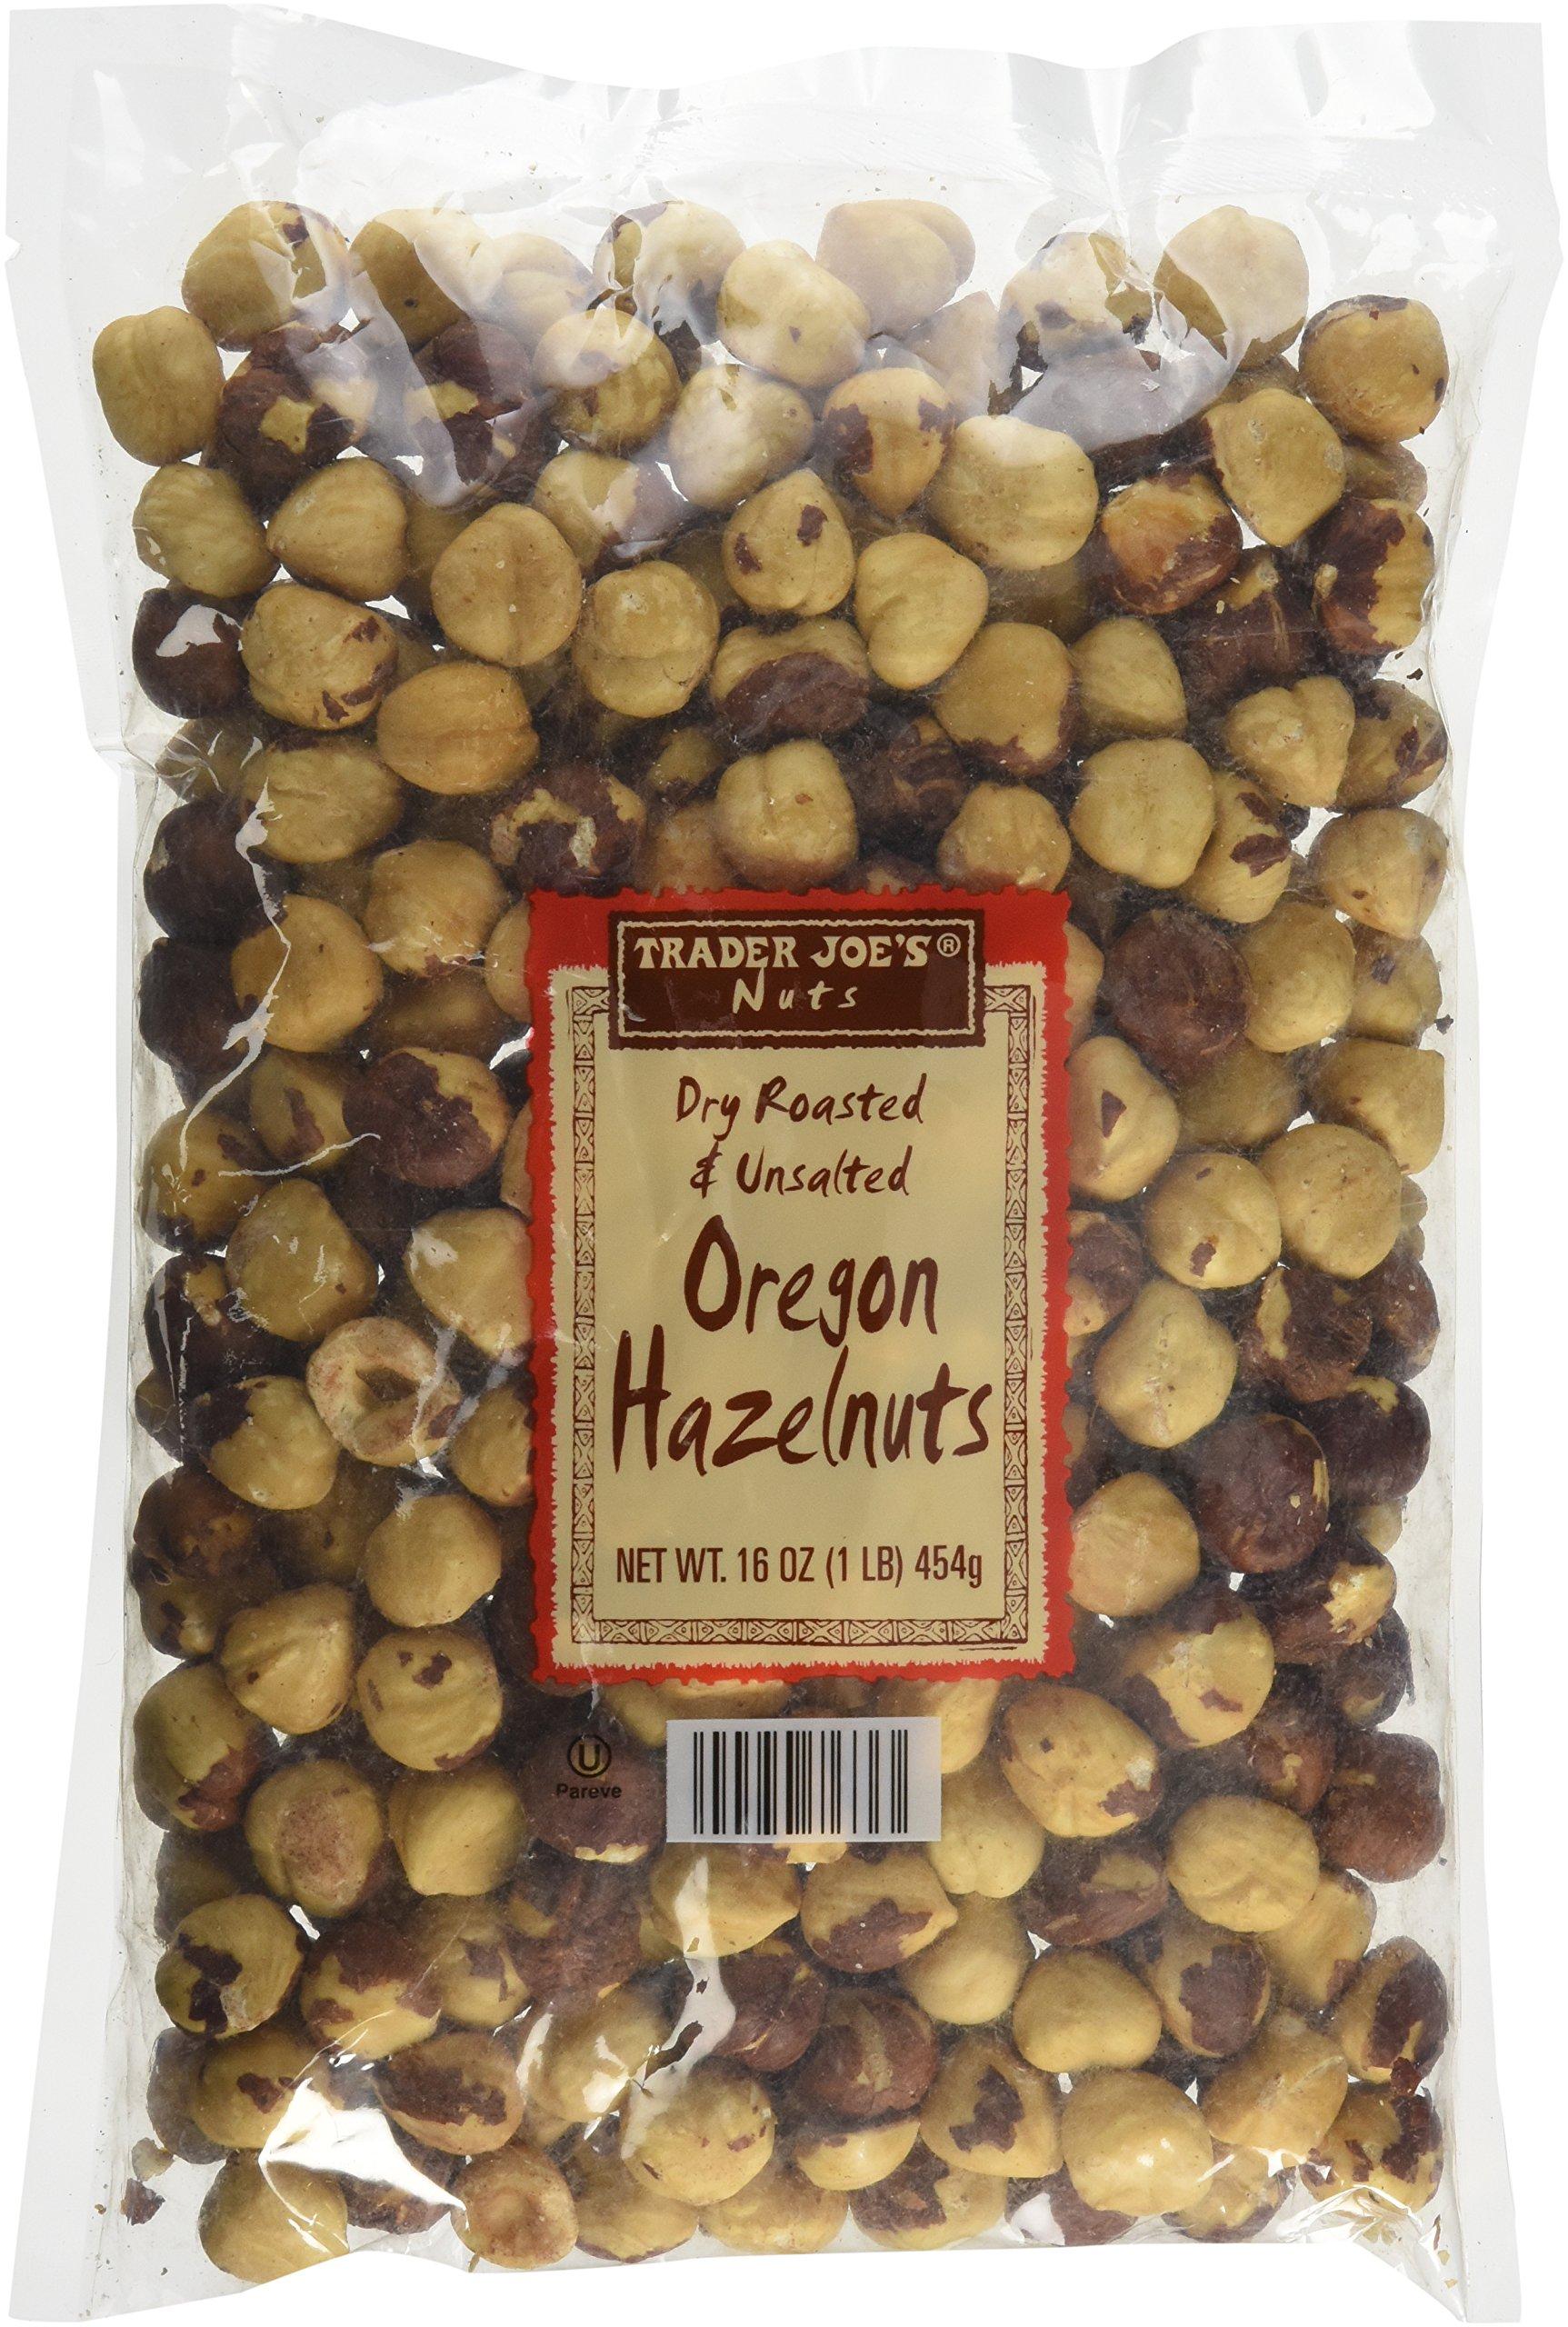 Trader Joe's Nuts Oven Roasted & Unsalted Oregon Hazelnuts - 16oz Set of 2